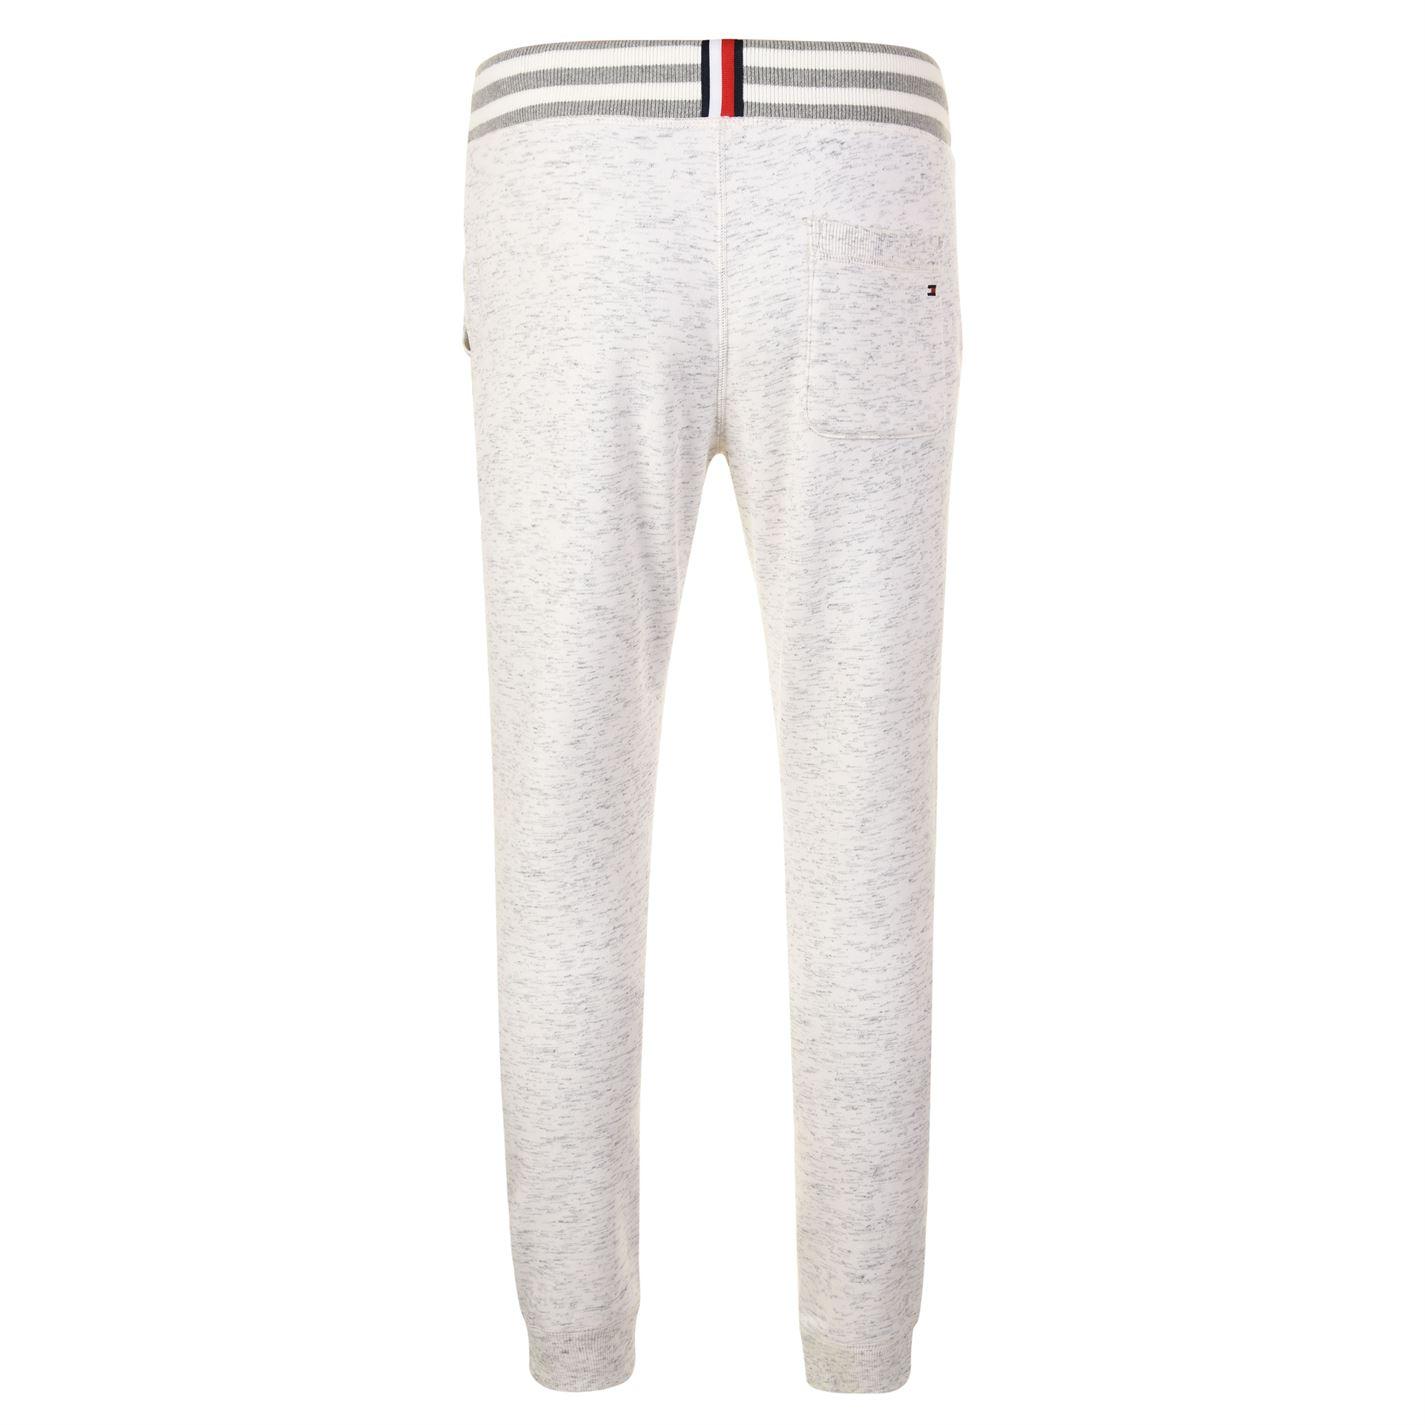 8168819bae Mens Tommy Hilfiger Jogging Bottoms Fleece Regular Fit New | eBay